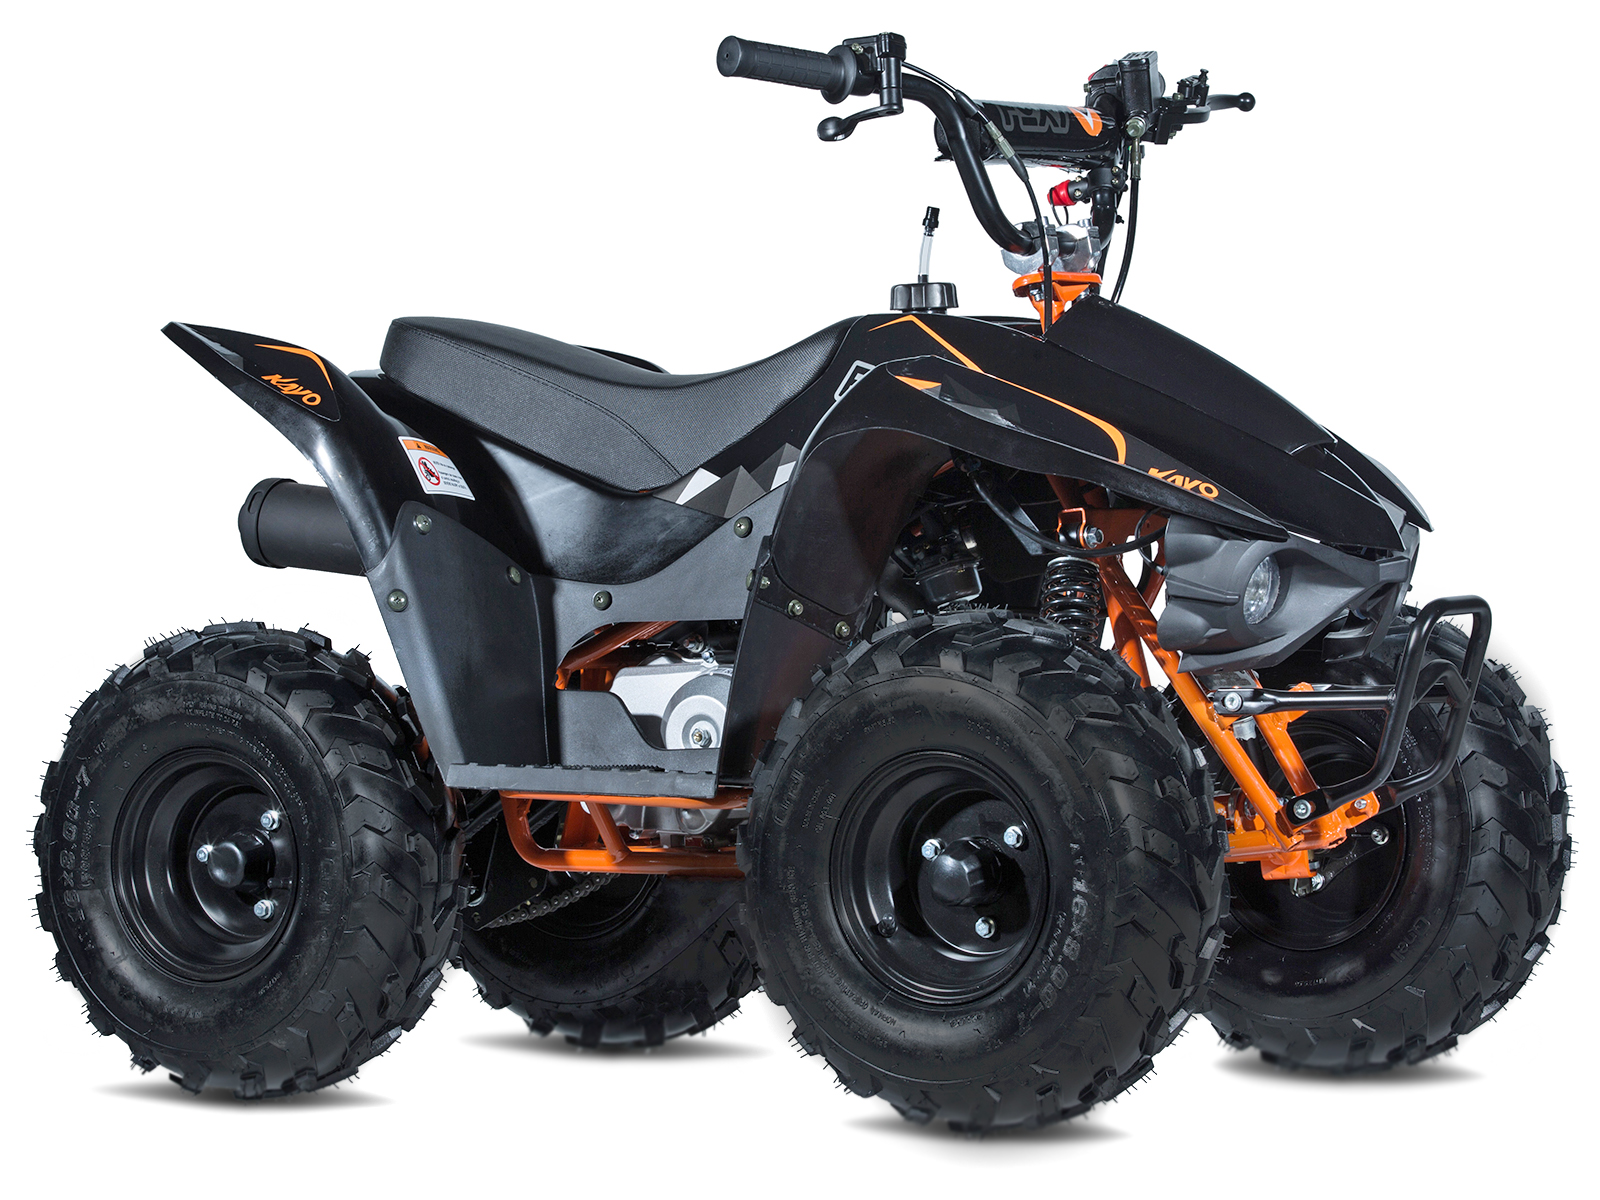 7c2ddd85510 KAYO FOX 70 ATV